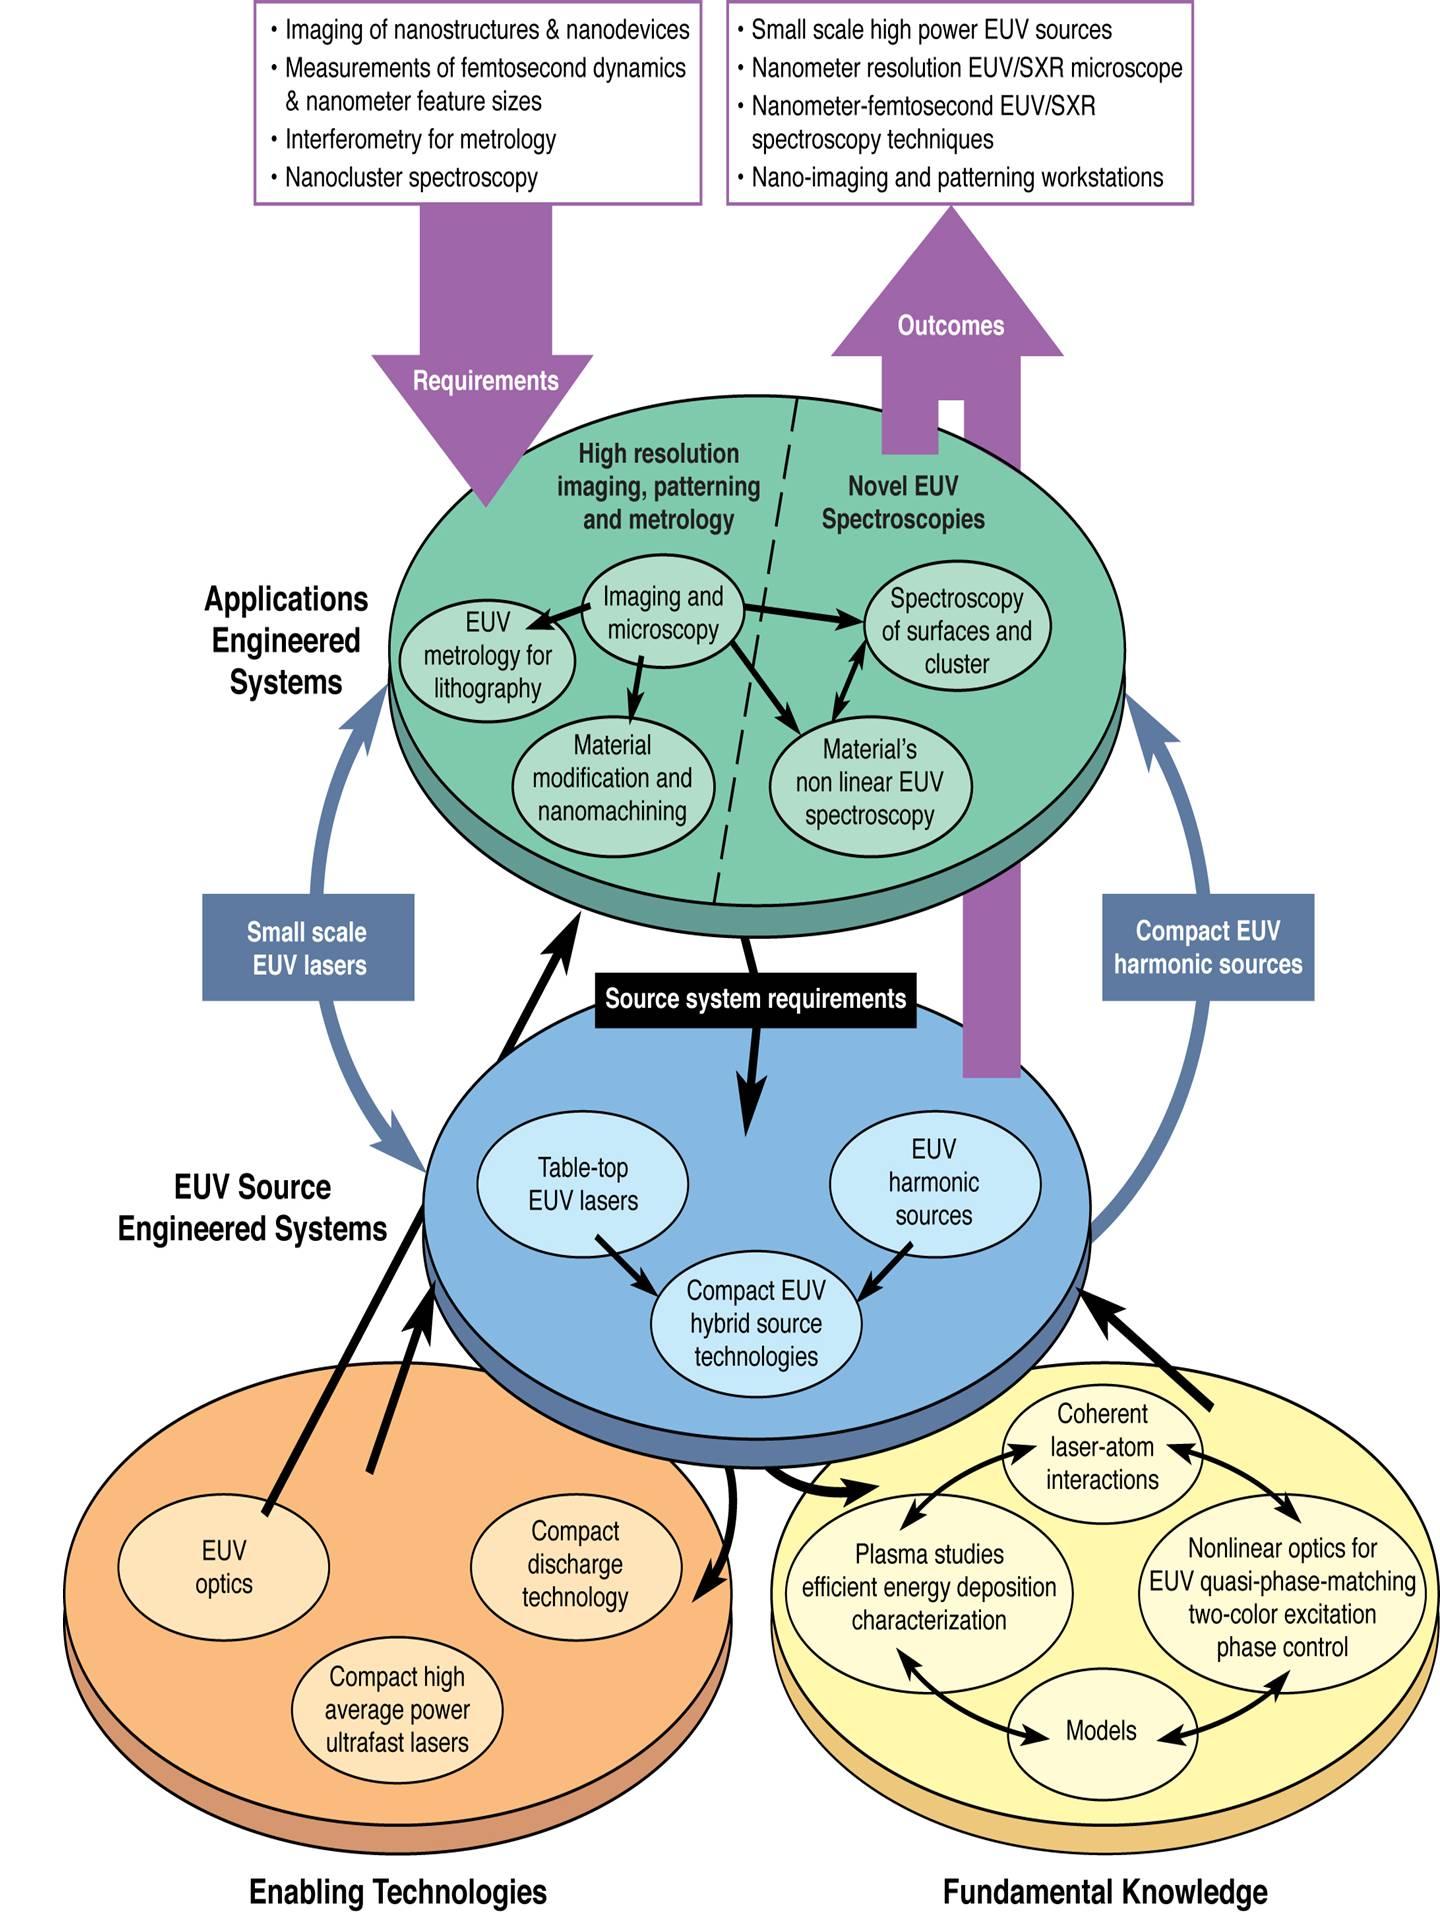 strategic planning framework diagram 1994 harley davidson wiring diagrams related keywords and suggestions